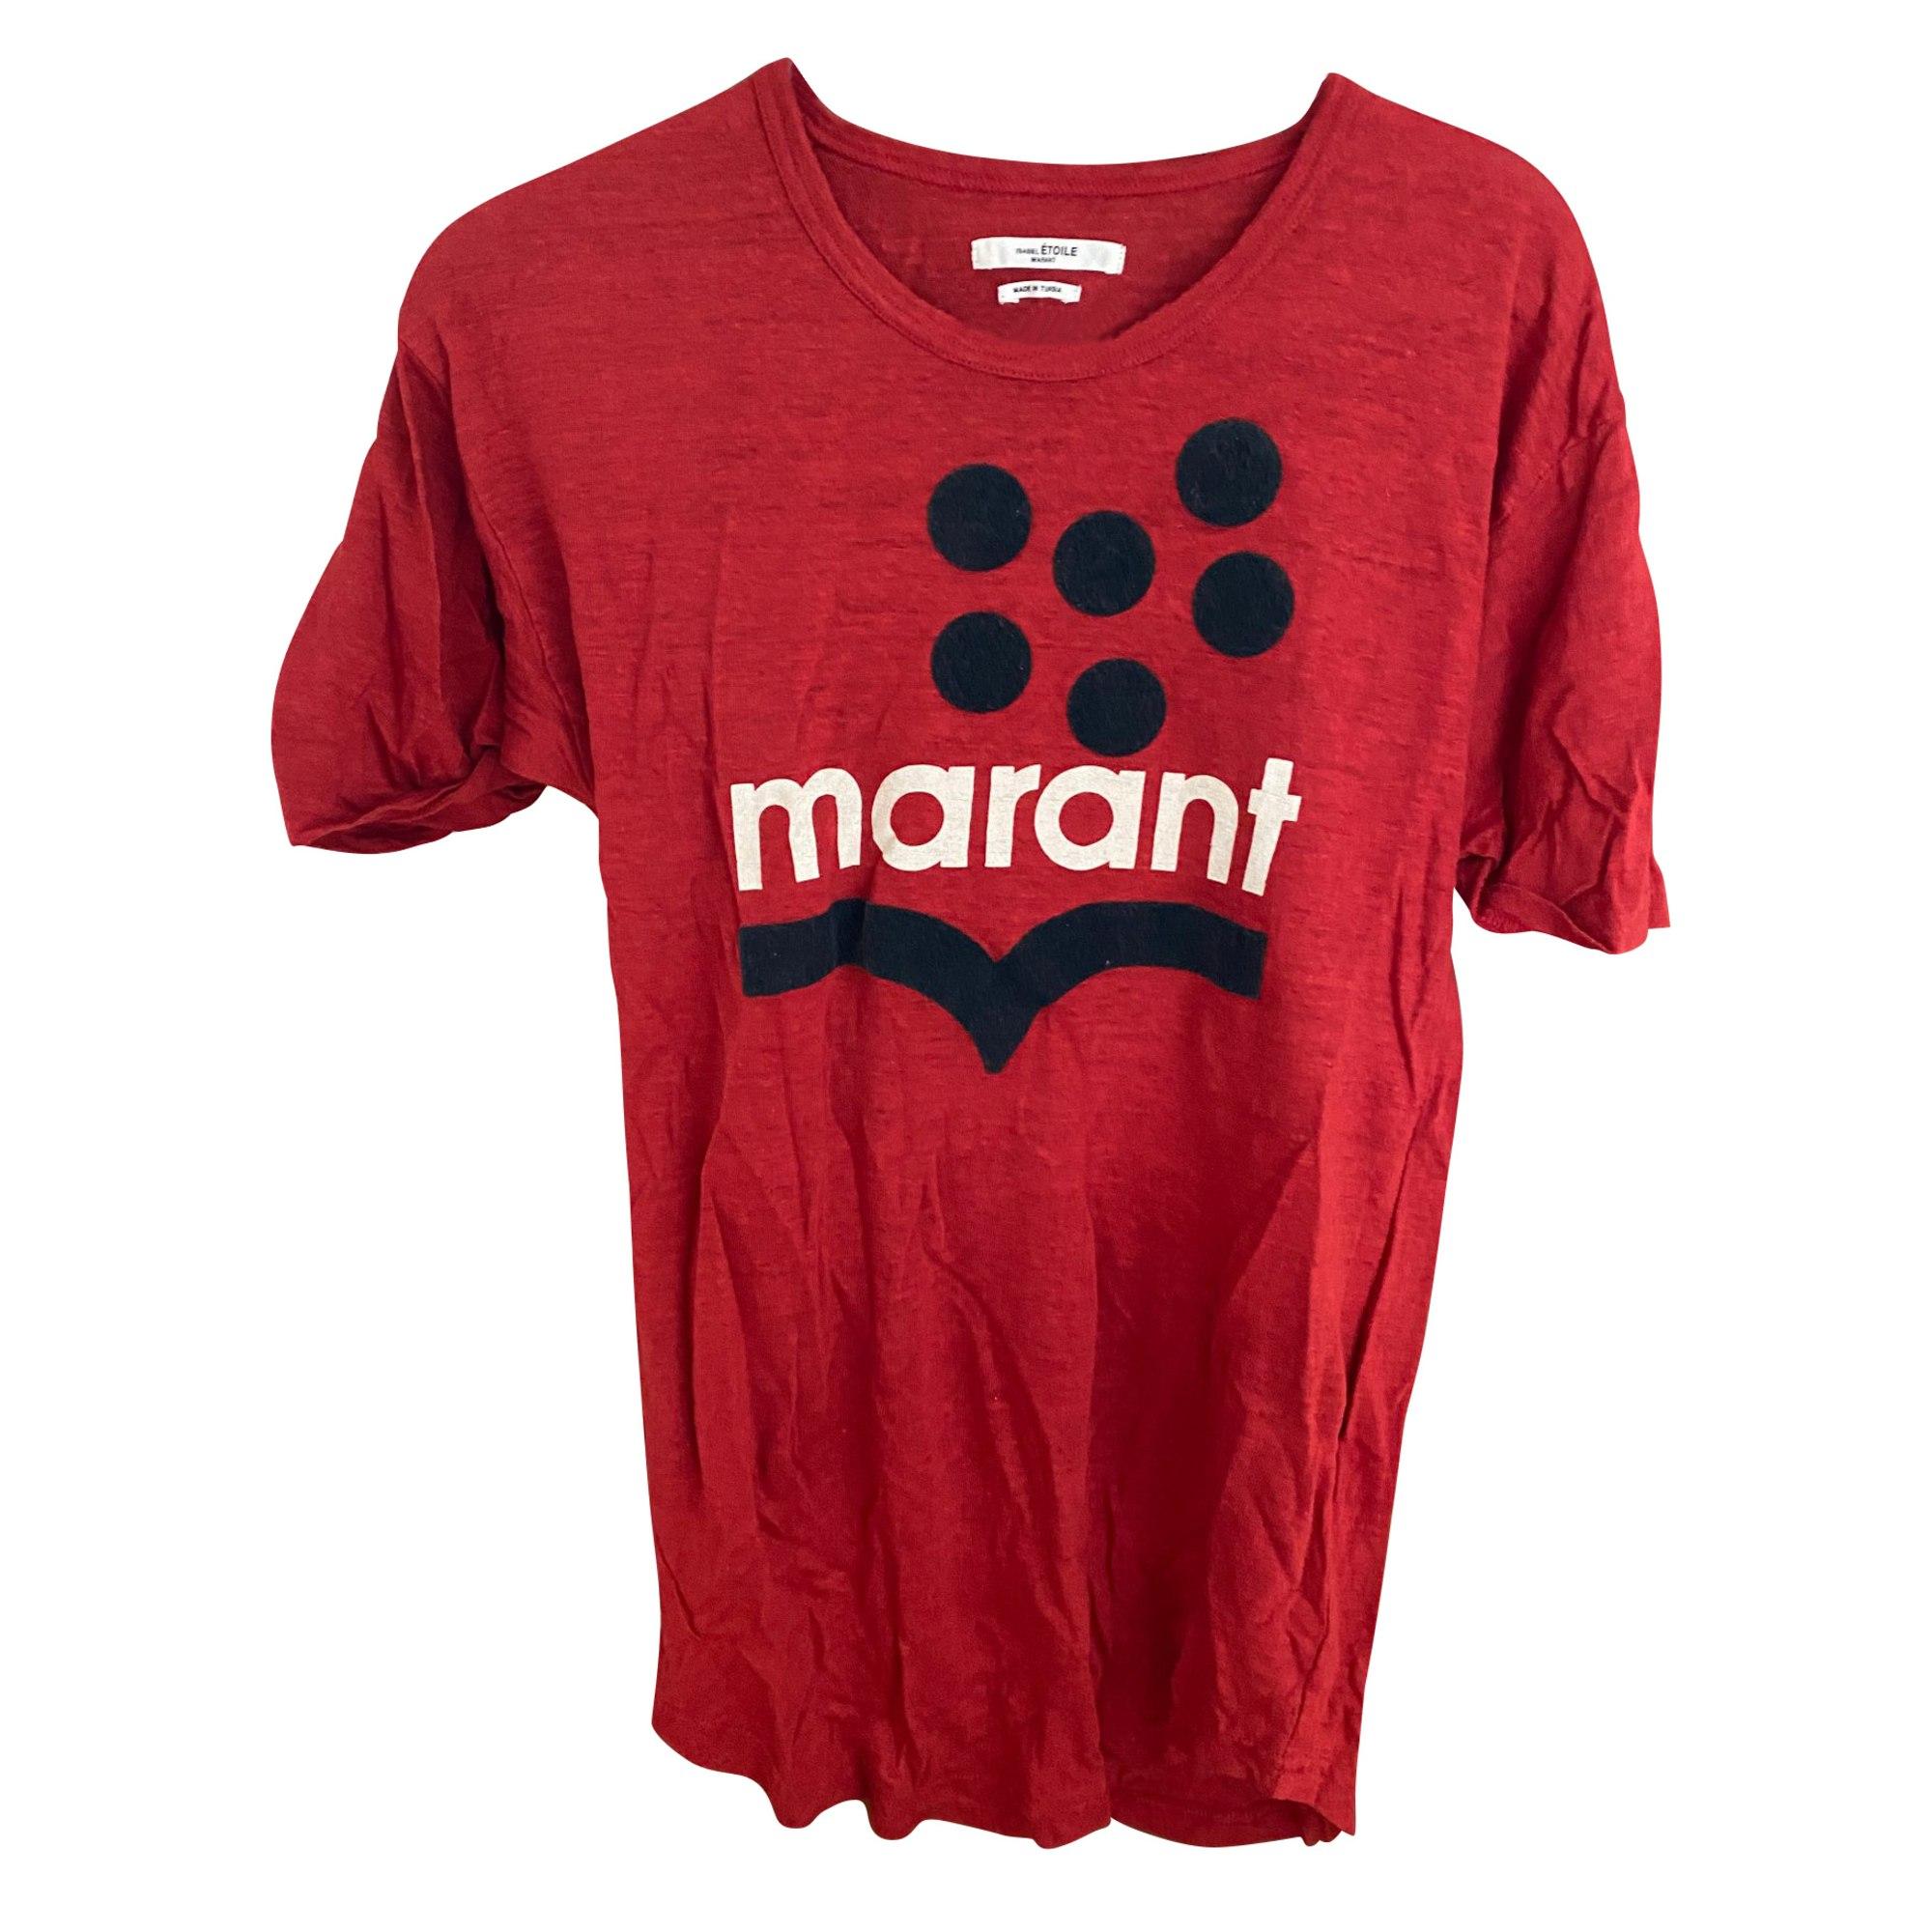 Top, tee-shirt ISABEL MARANT ETOILE Rouge, bordeaux